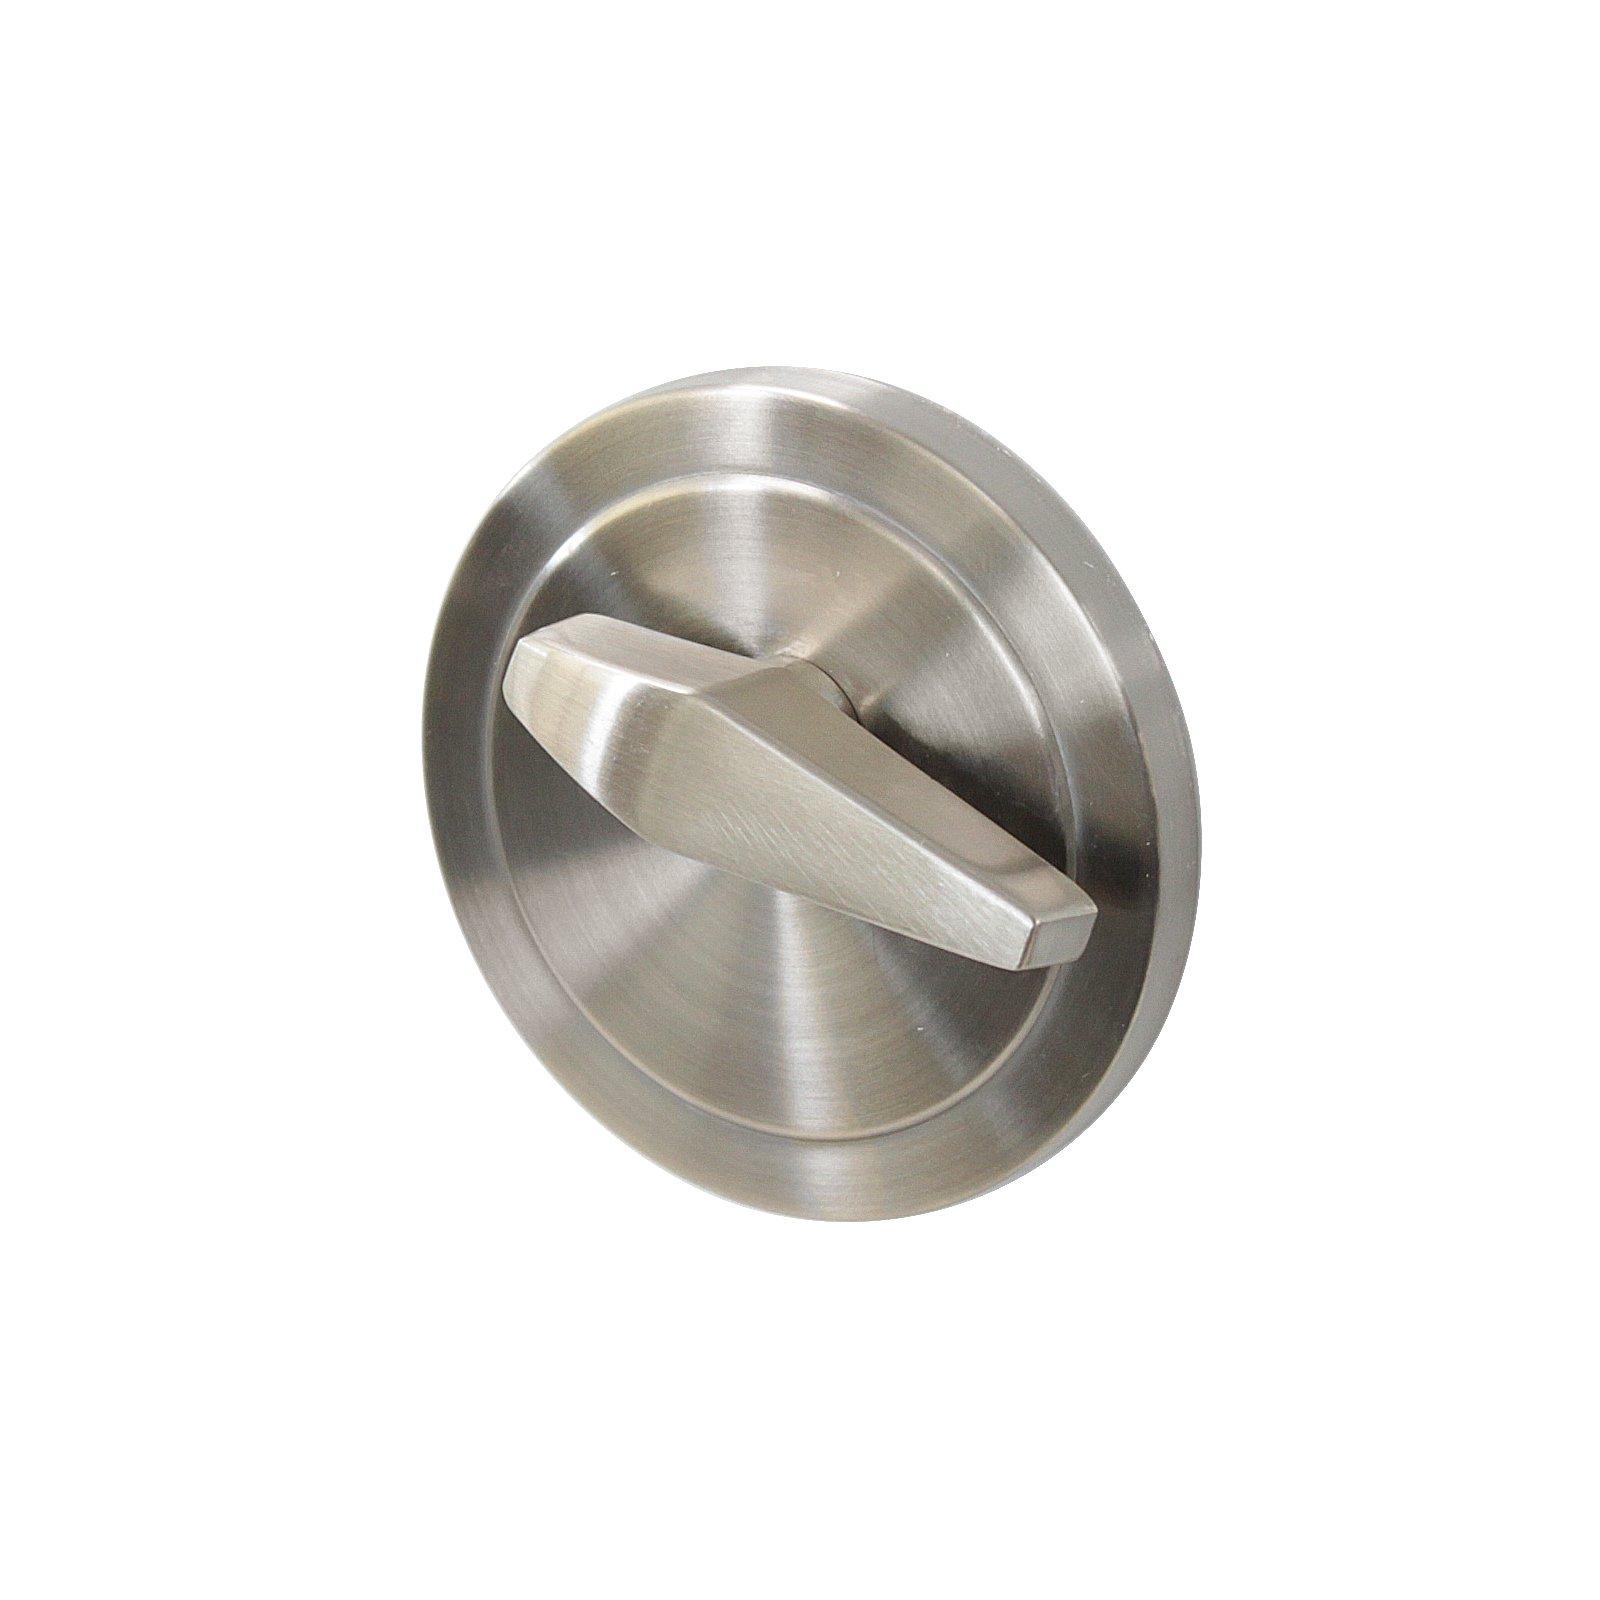 3 Pack Probrico Interior Bedroom Single Cylinder Deadbolt One Keyway Keyed Alike Same Key Safety Bolt Door Lock Lockset in Satin Nickel-Single Deadbolt-101 by Probrico (Image #6)